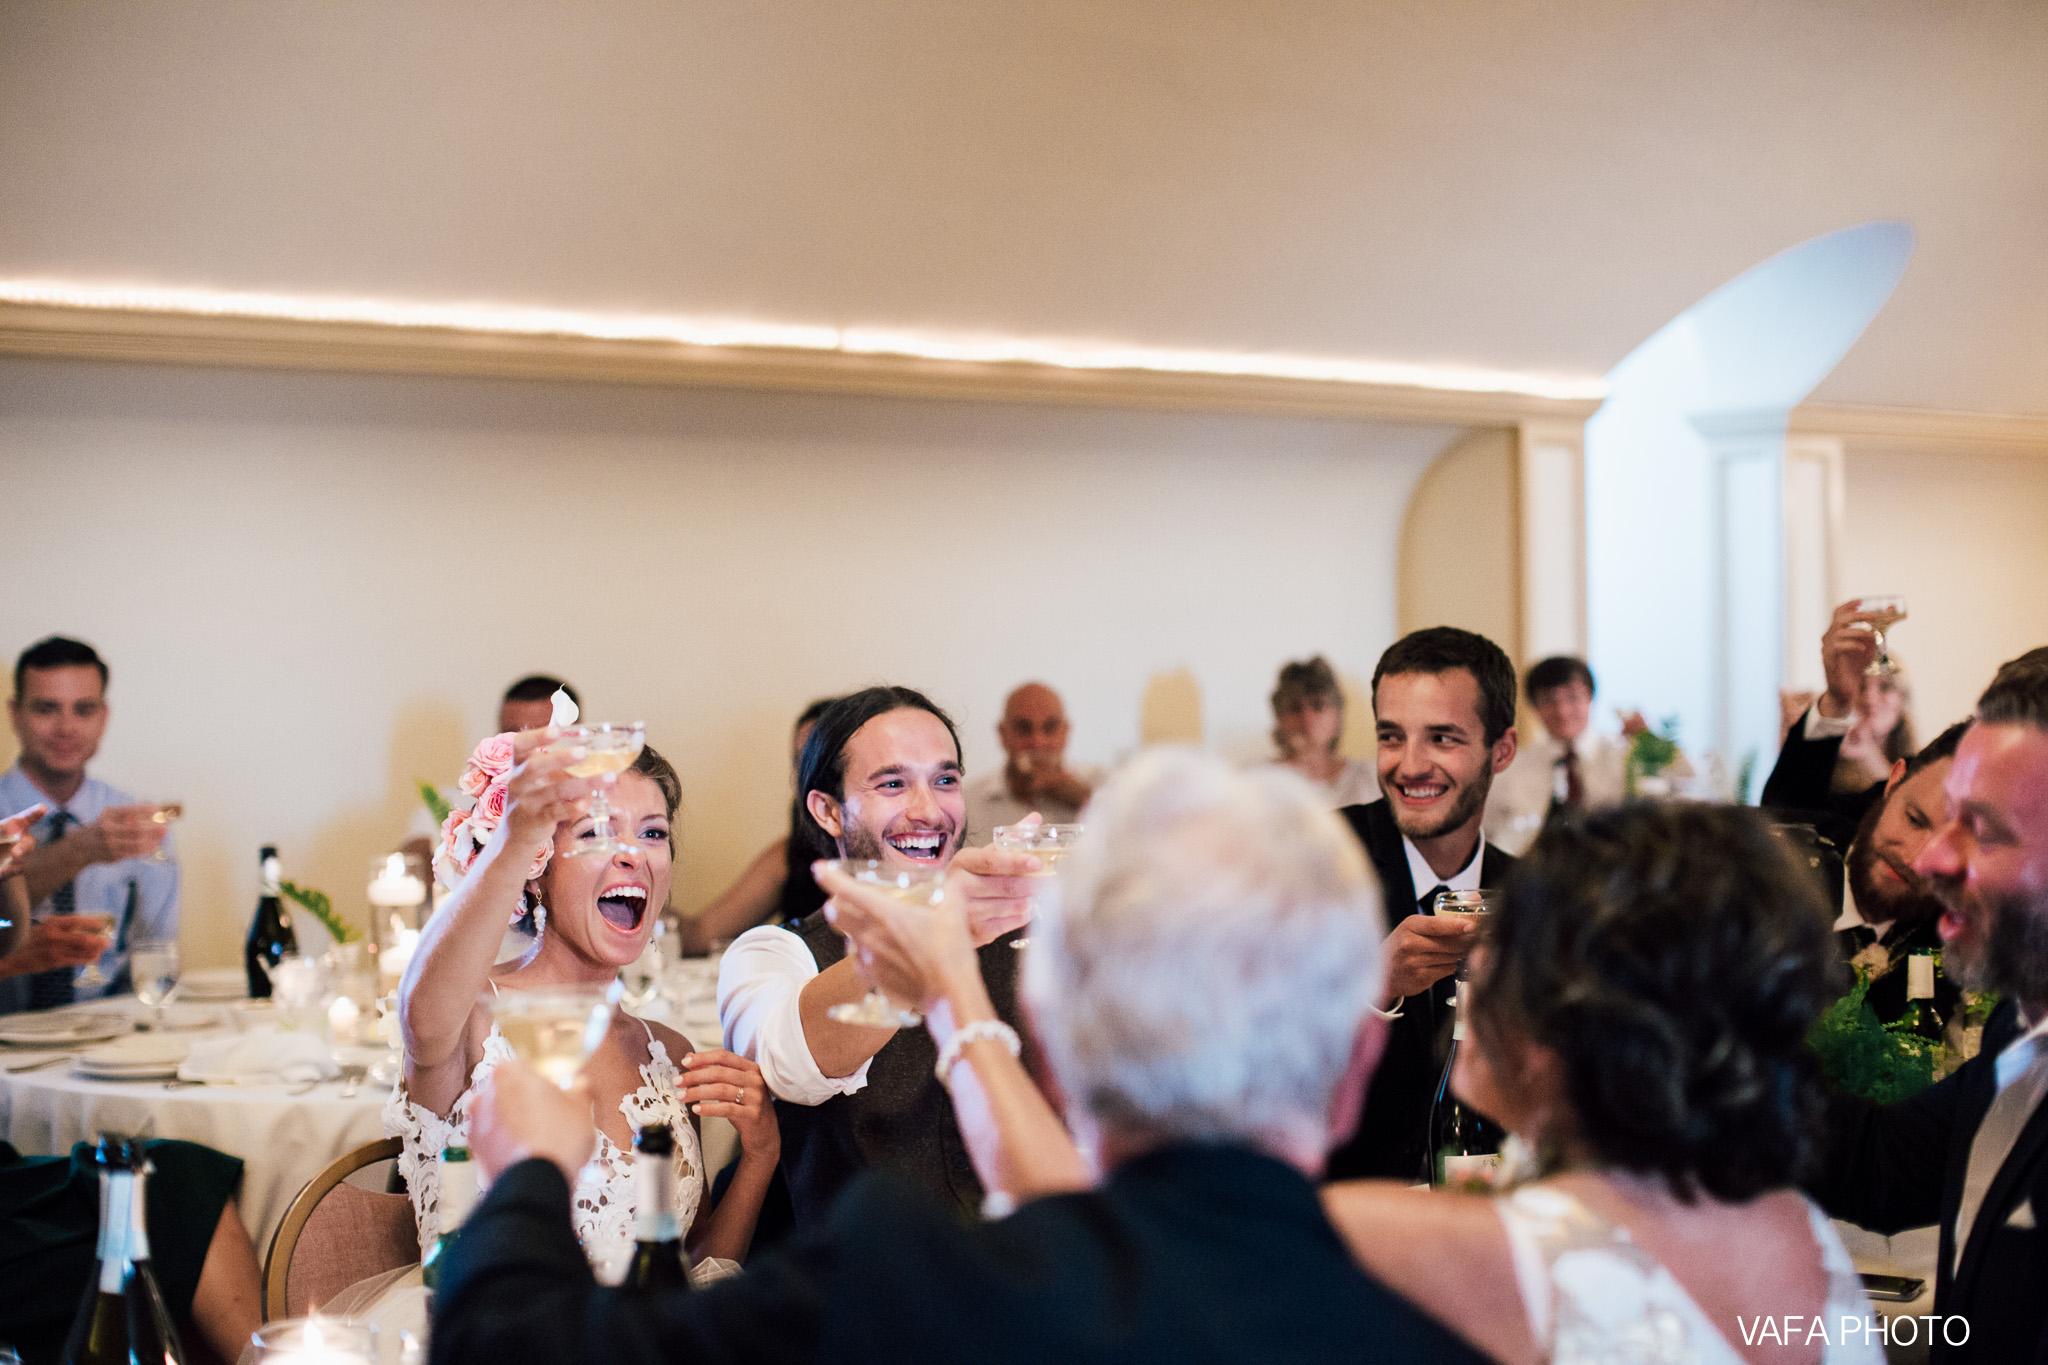 The-Felt-Estate-Wedding-Kailie-David-Vafa-Photo-958.jpg